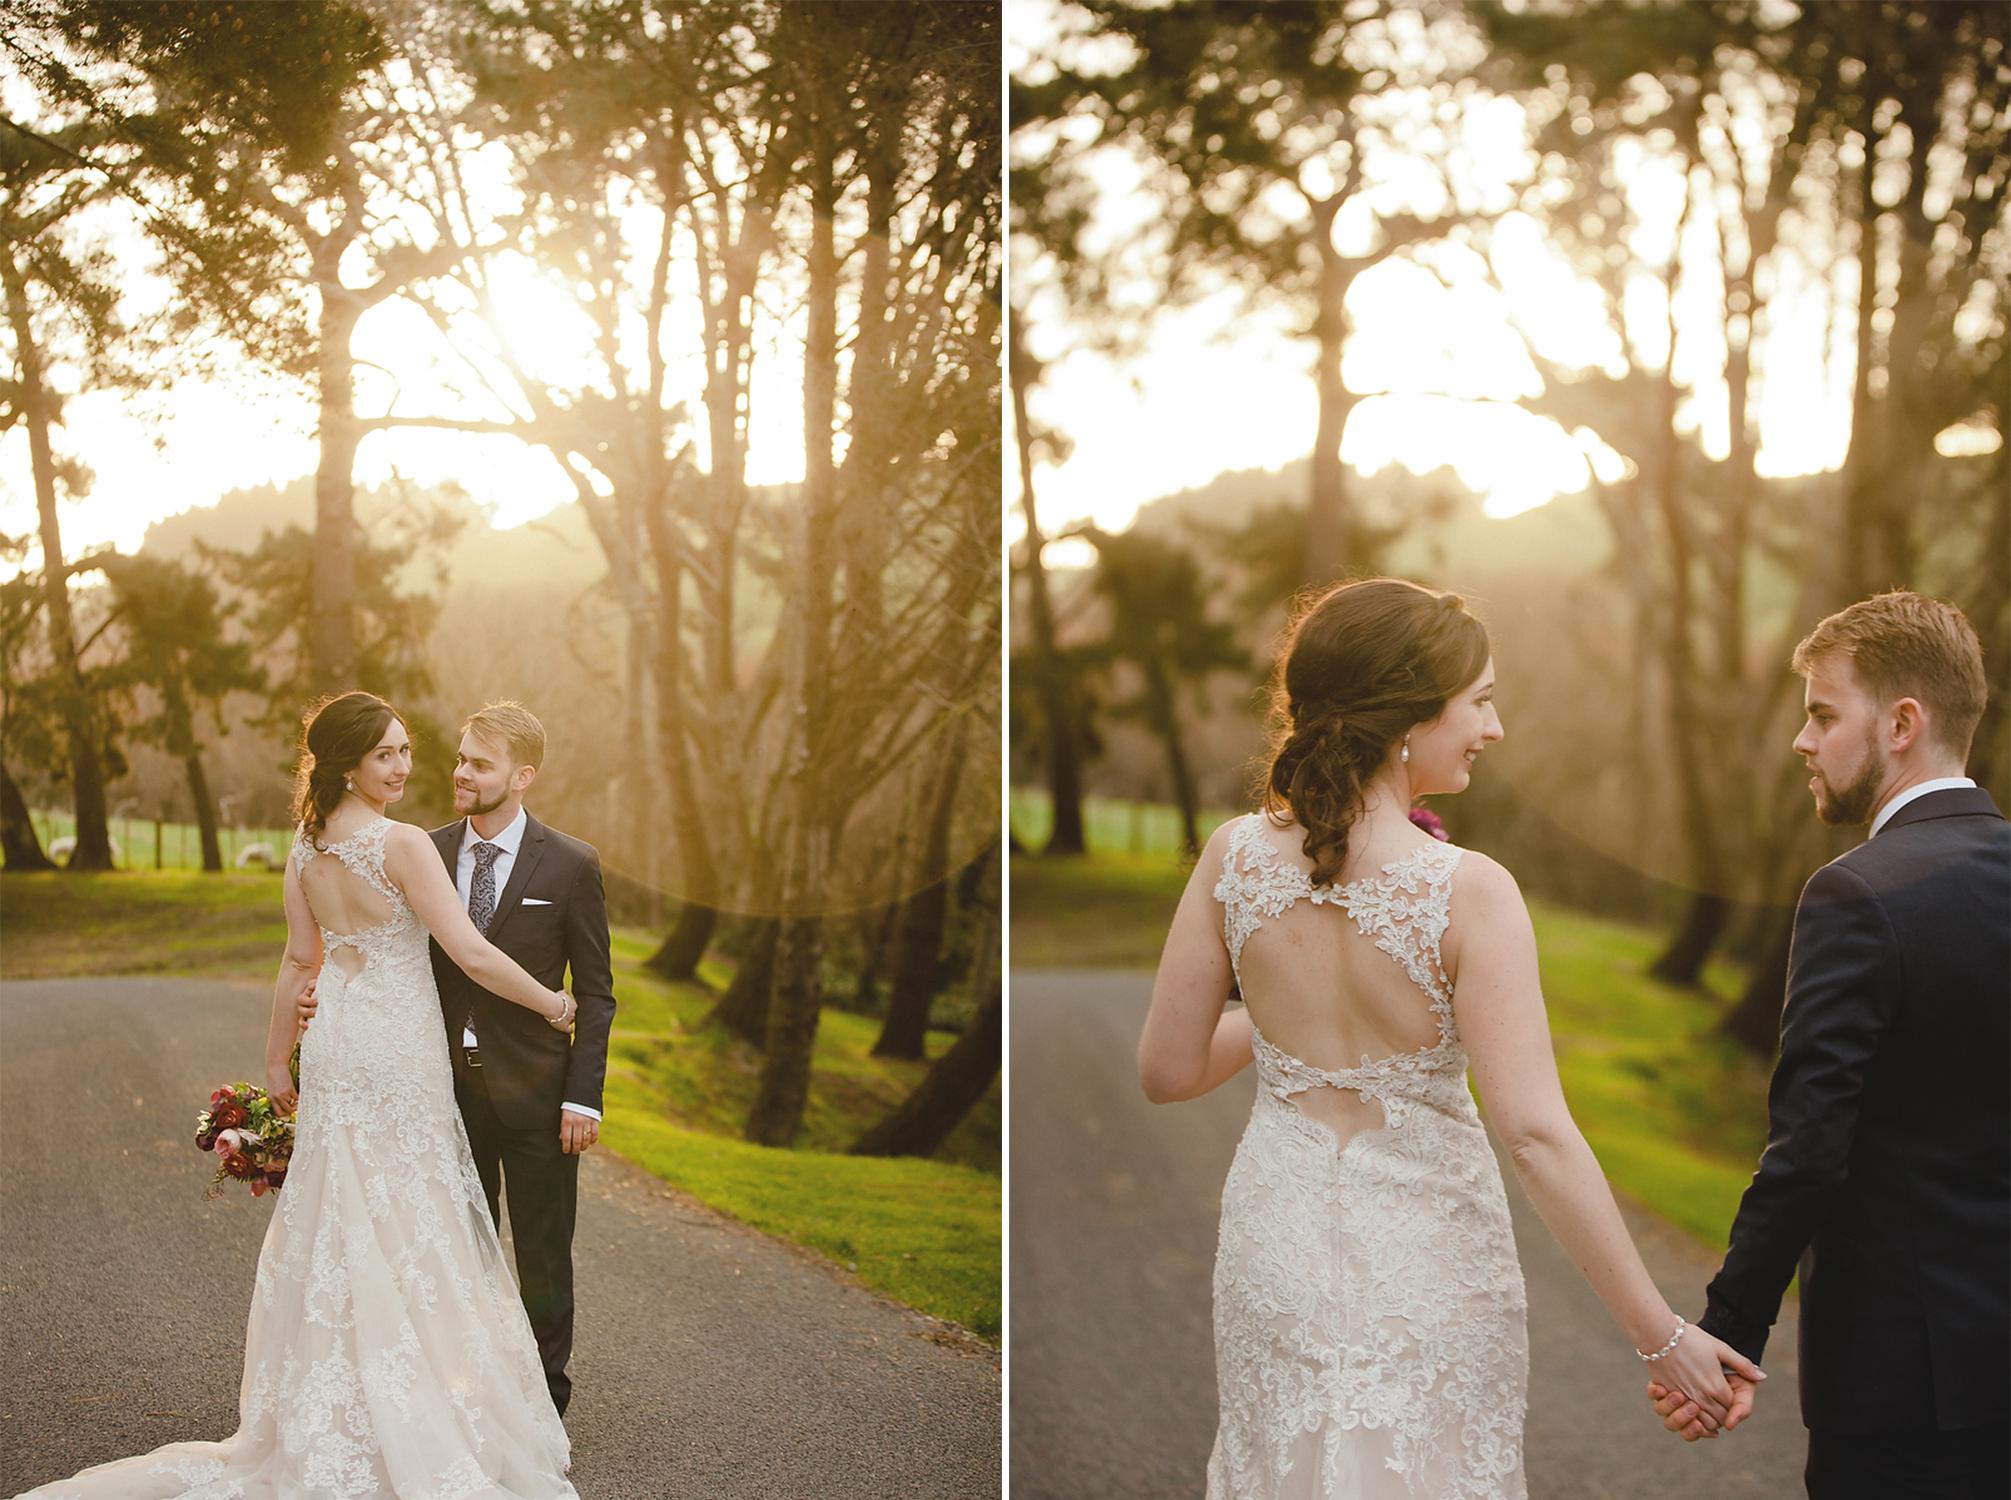 wellington wedding photography NZ - 0174.JPG